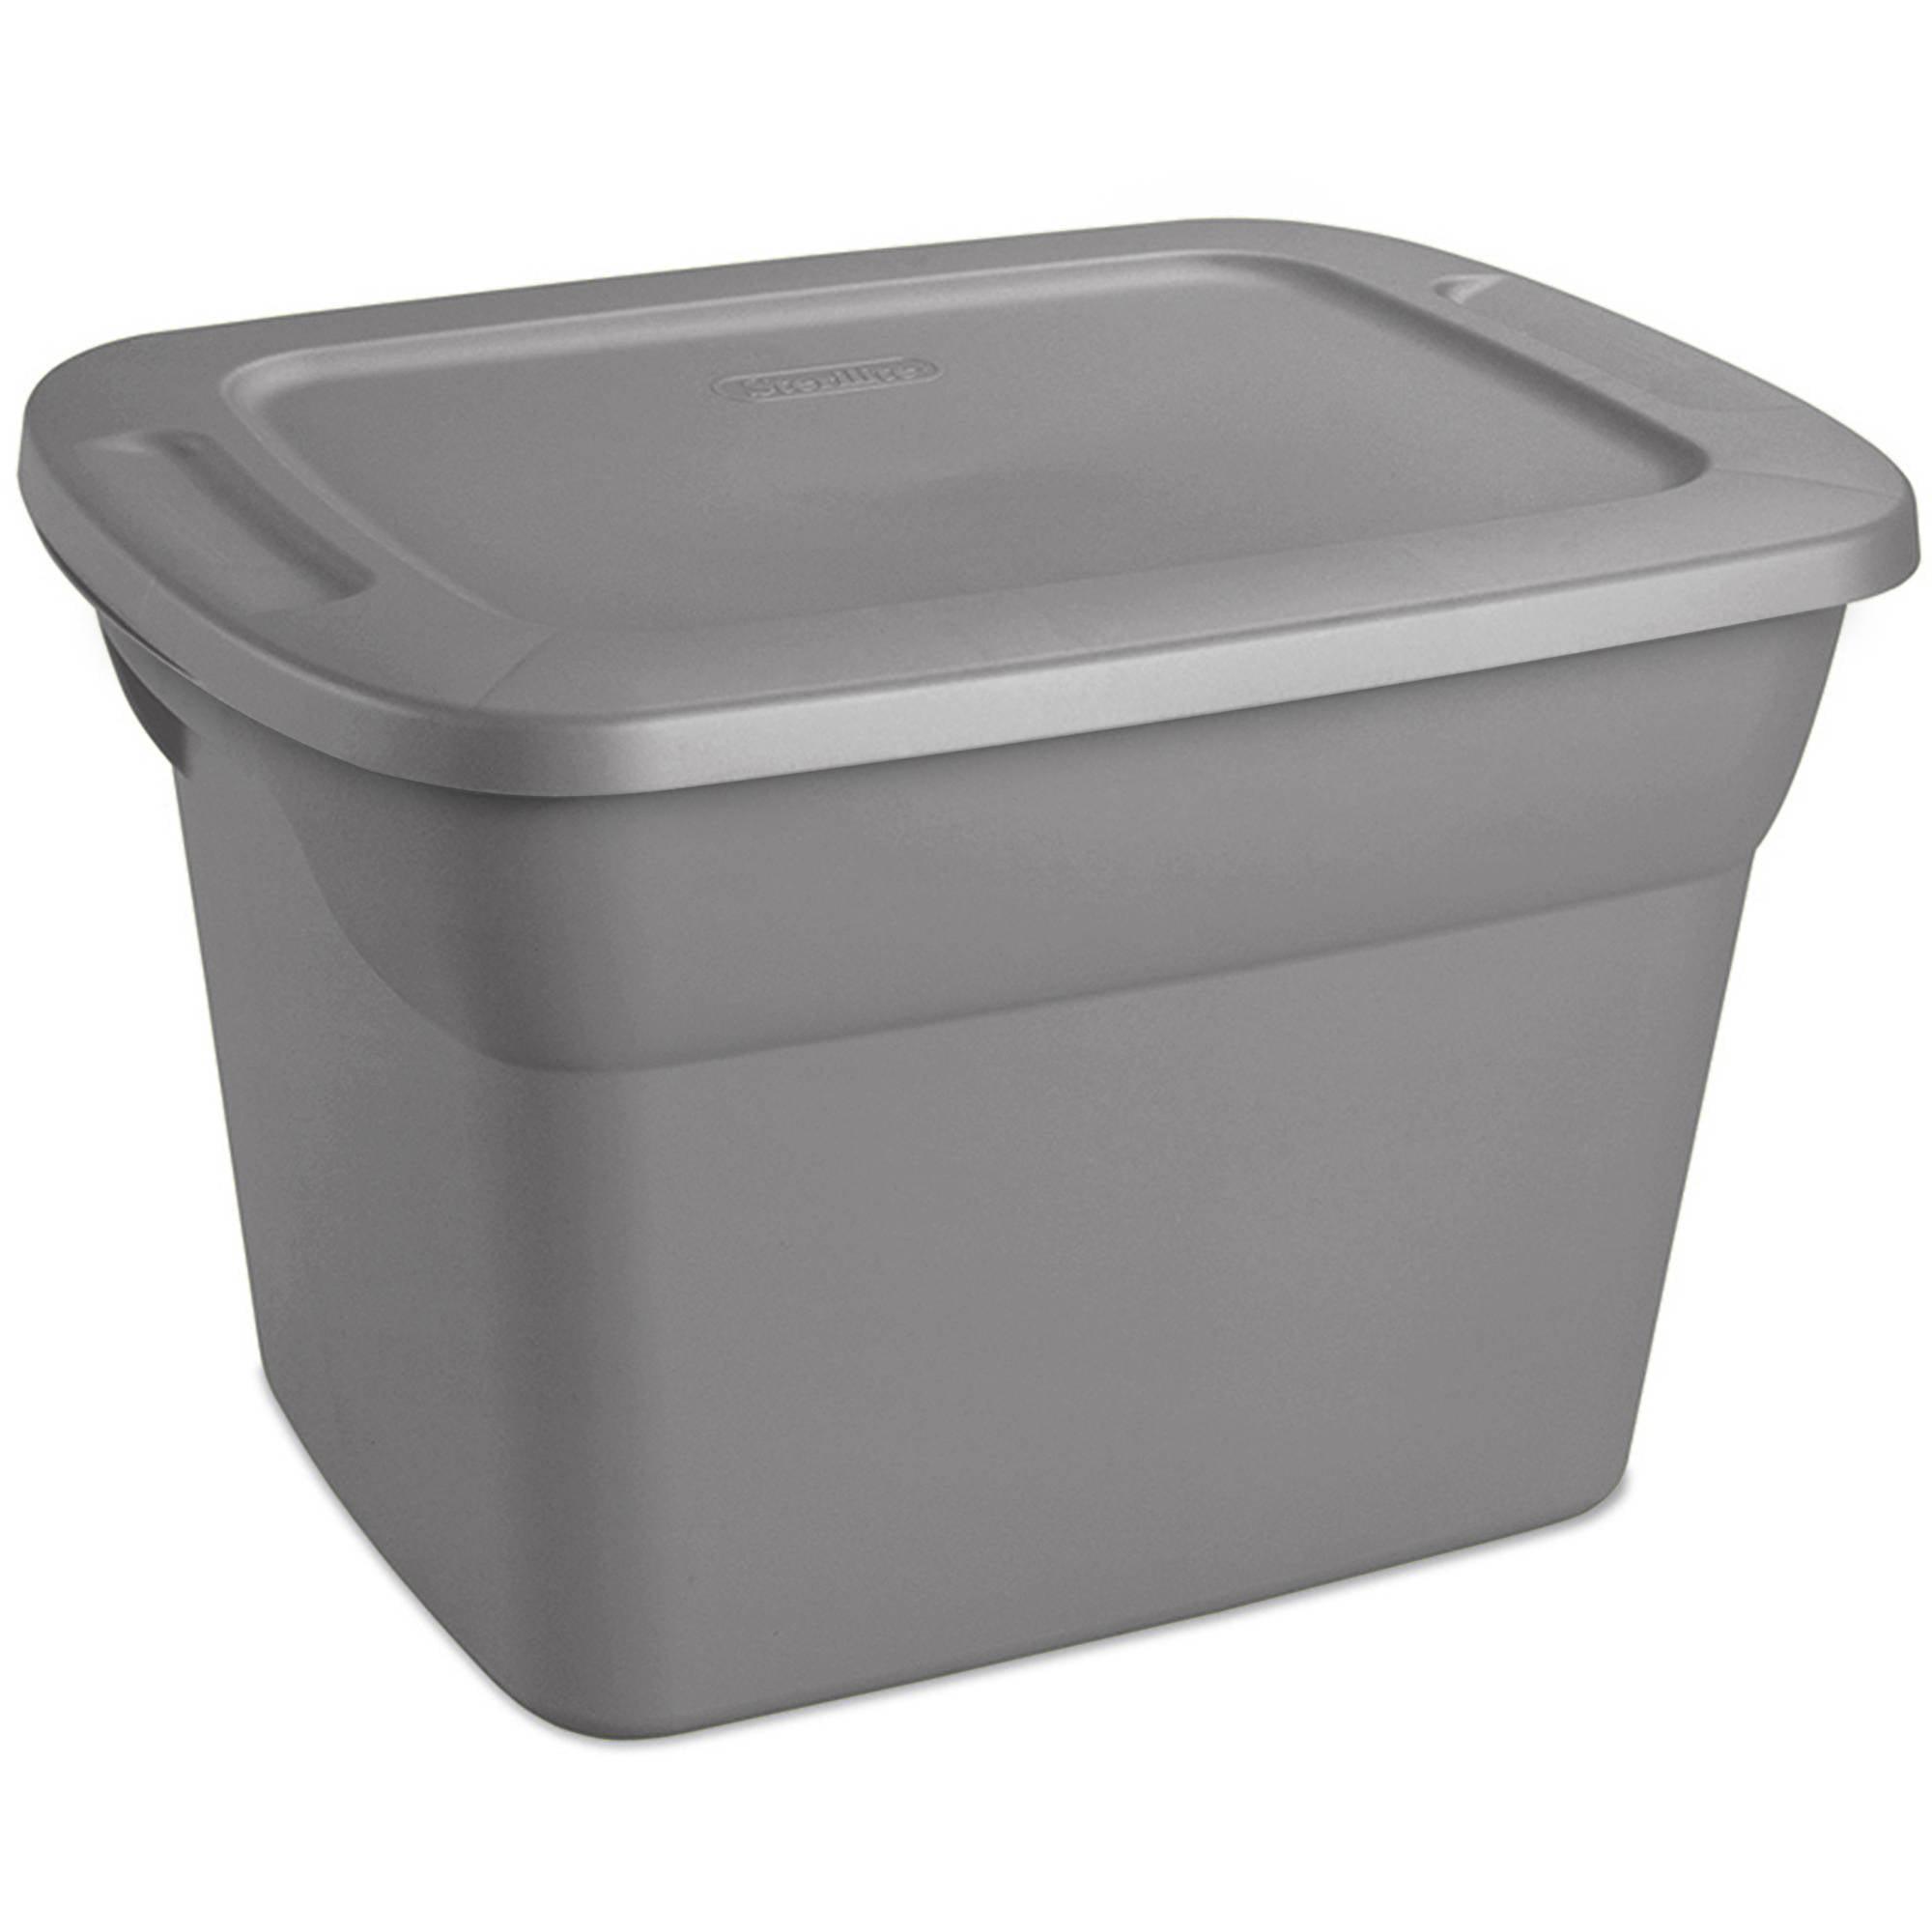 Sterilite 10 Gallon Tote- Steel (Available in Case of 9 or Single Unit)